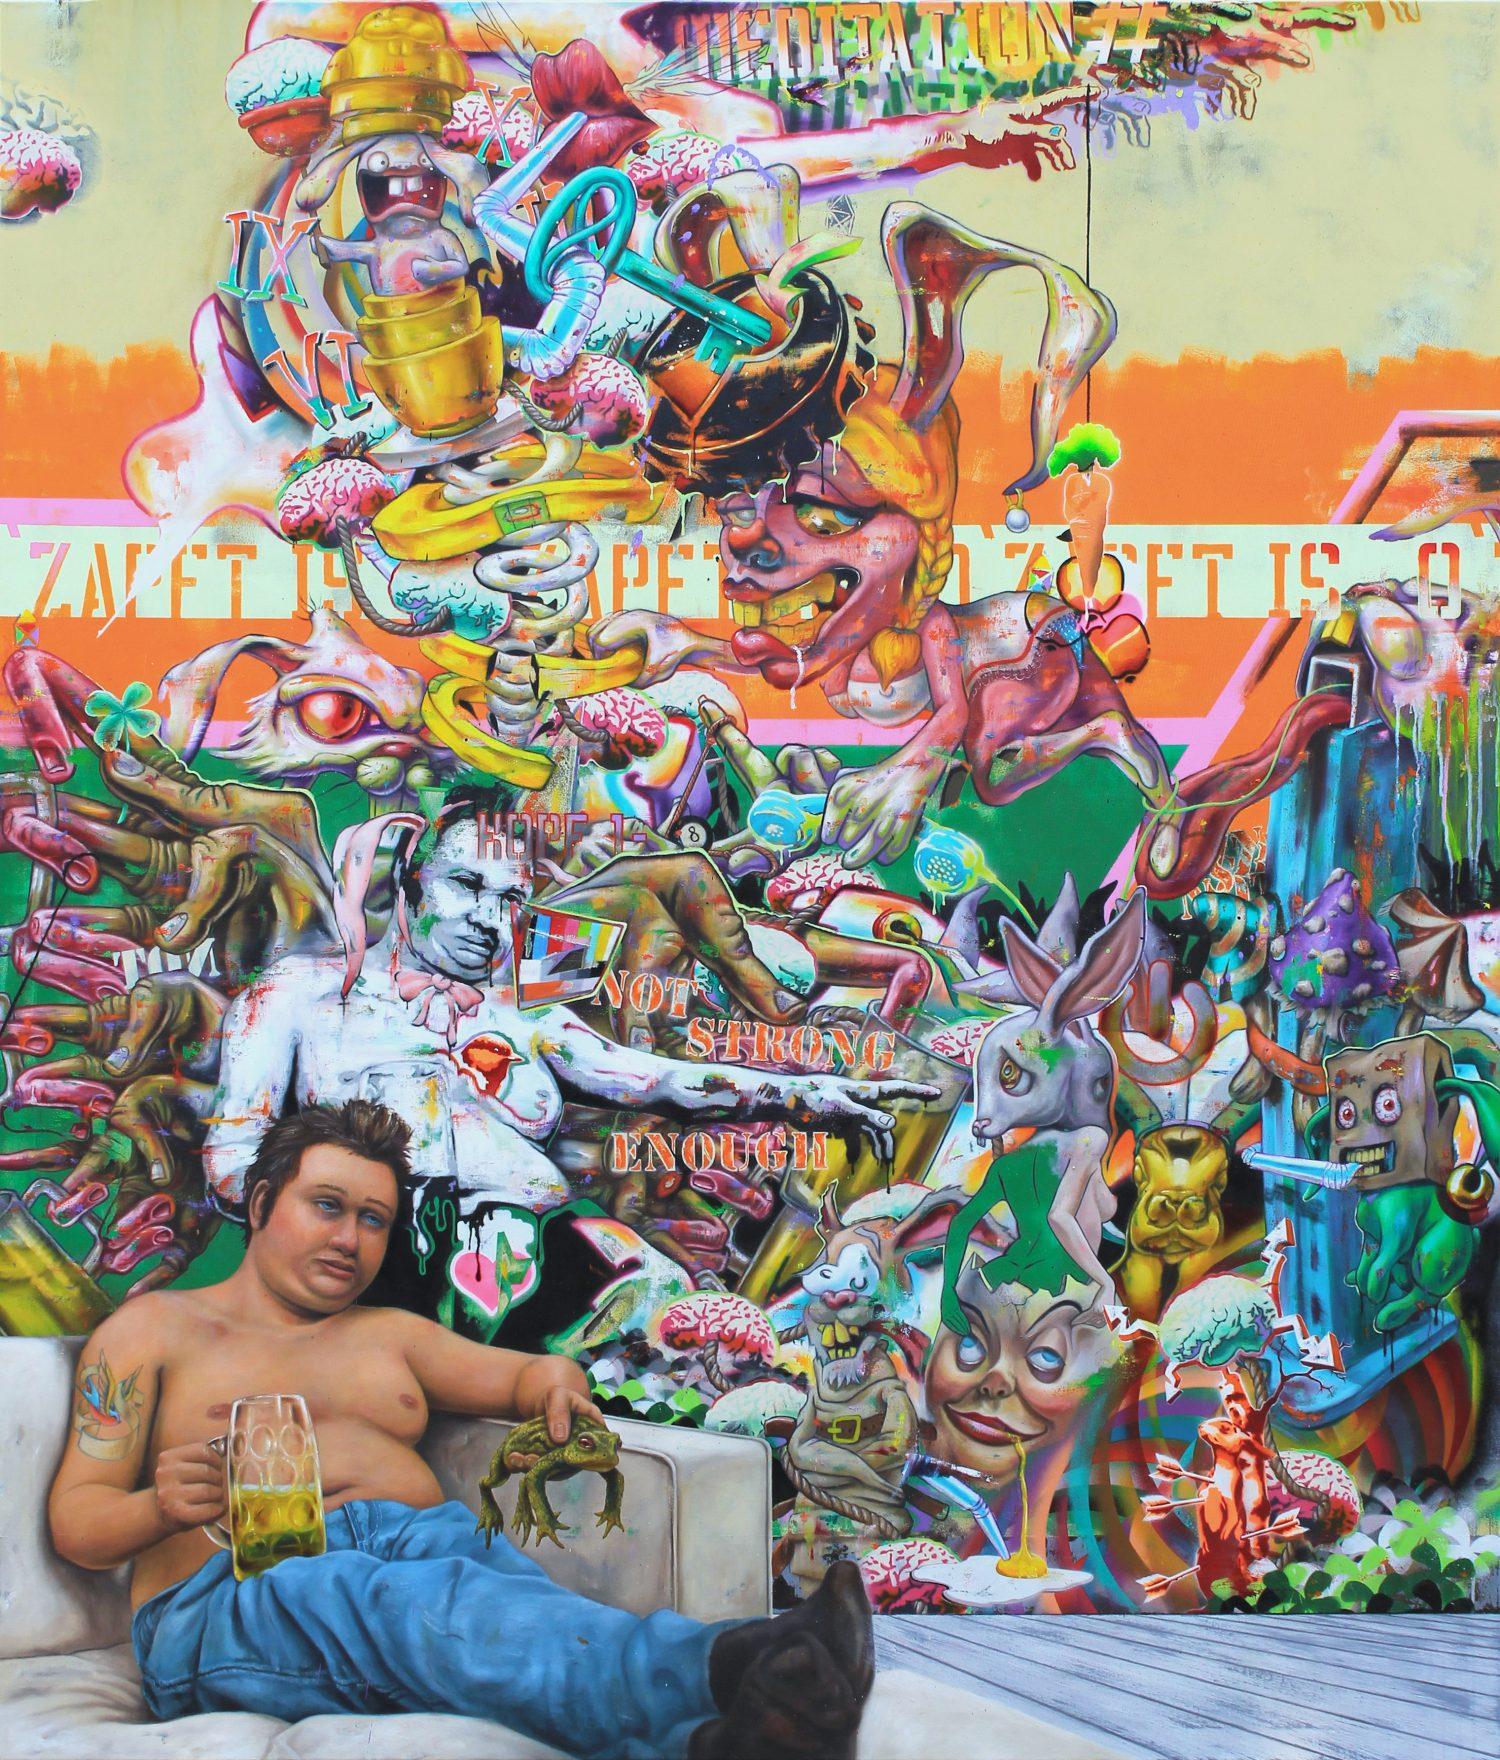 Robert Matthes, not strong enough, 200x170 cm, 2017, Acryl, Öl und Lack auf Nessel